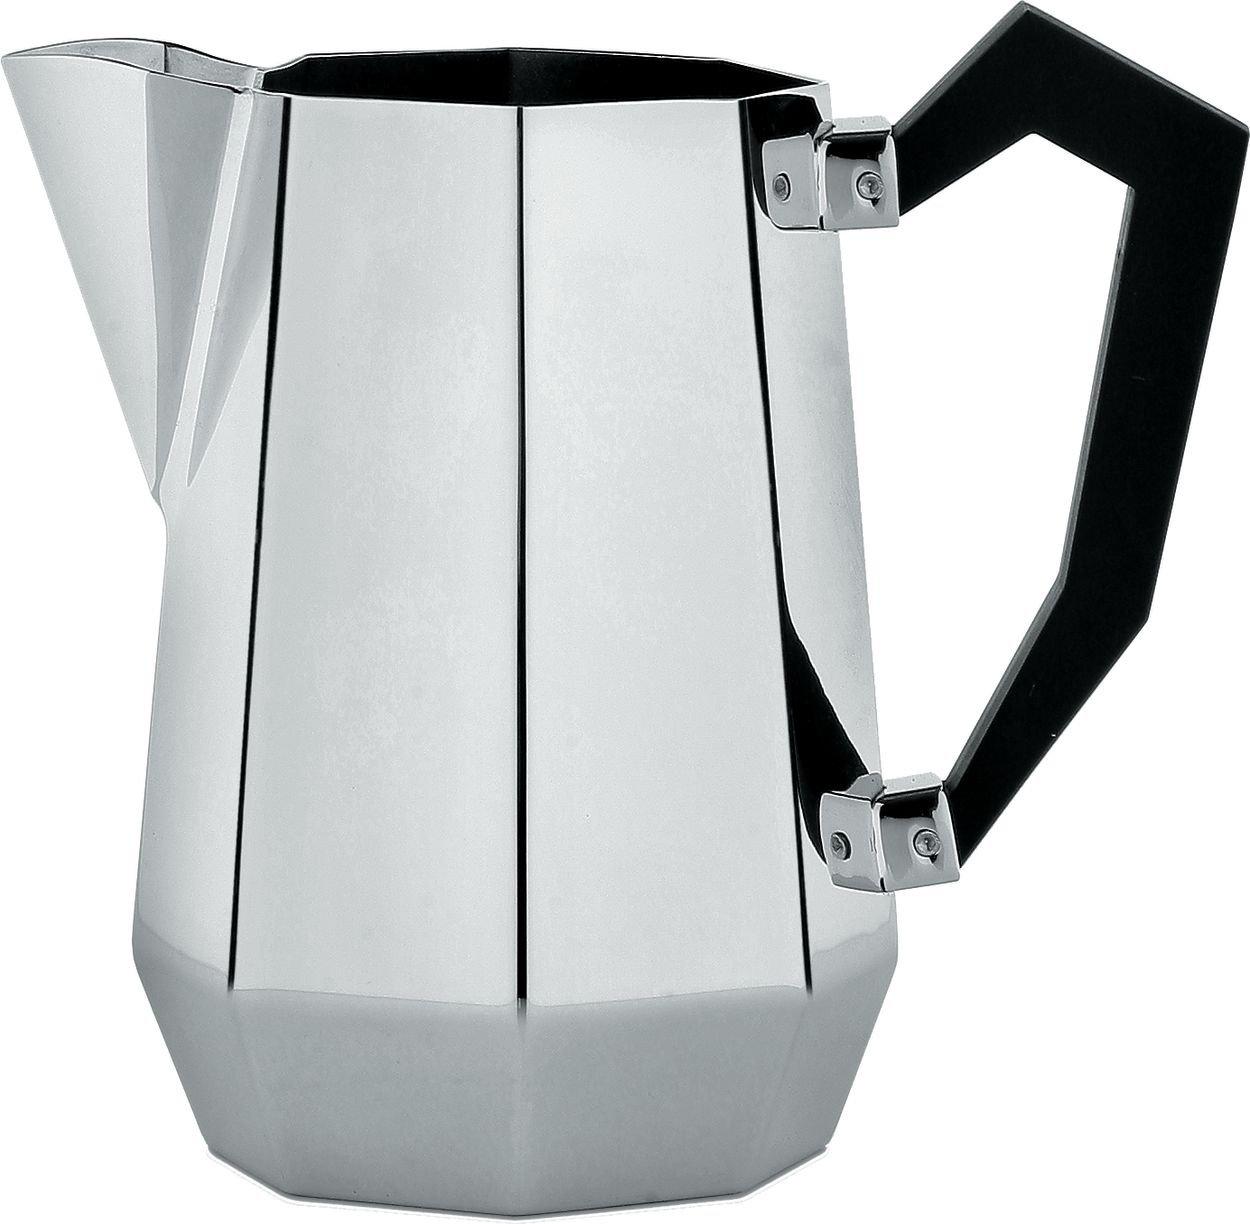 Alessi 25 cl Milk Jug in 18//10 Stainless Steel Mirror Polished